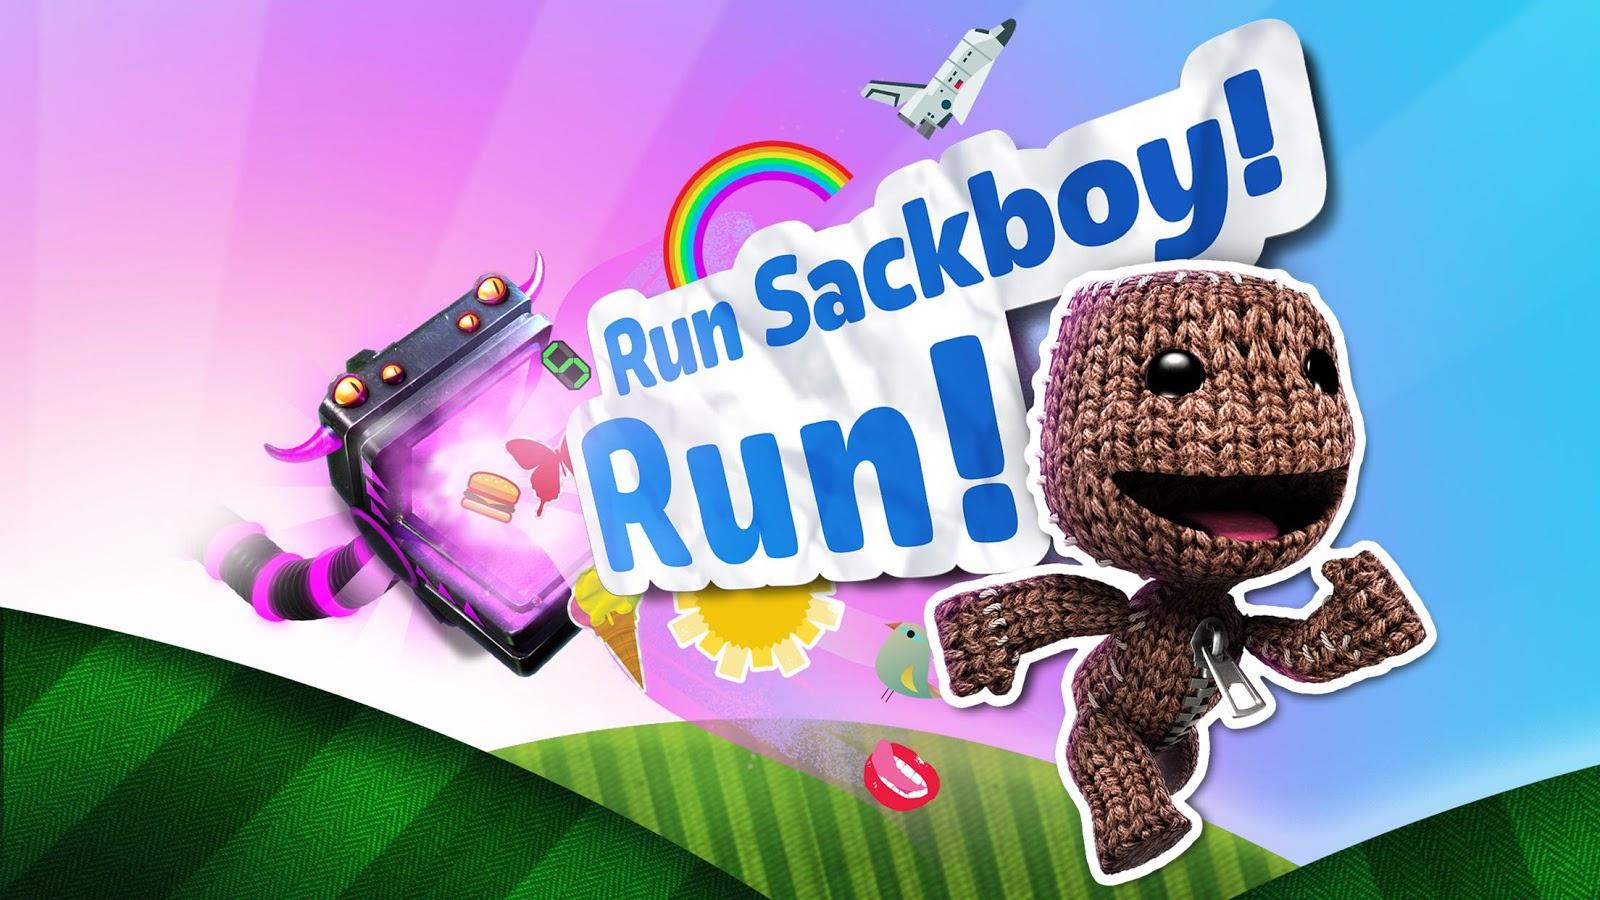 Run Sackboy Run.jpg